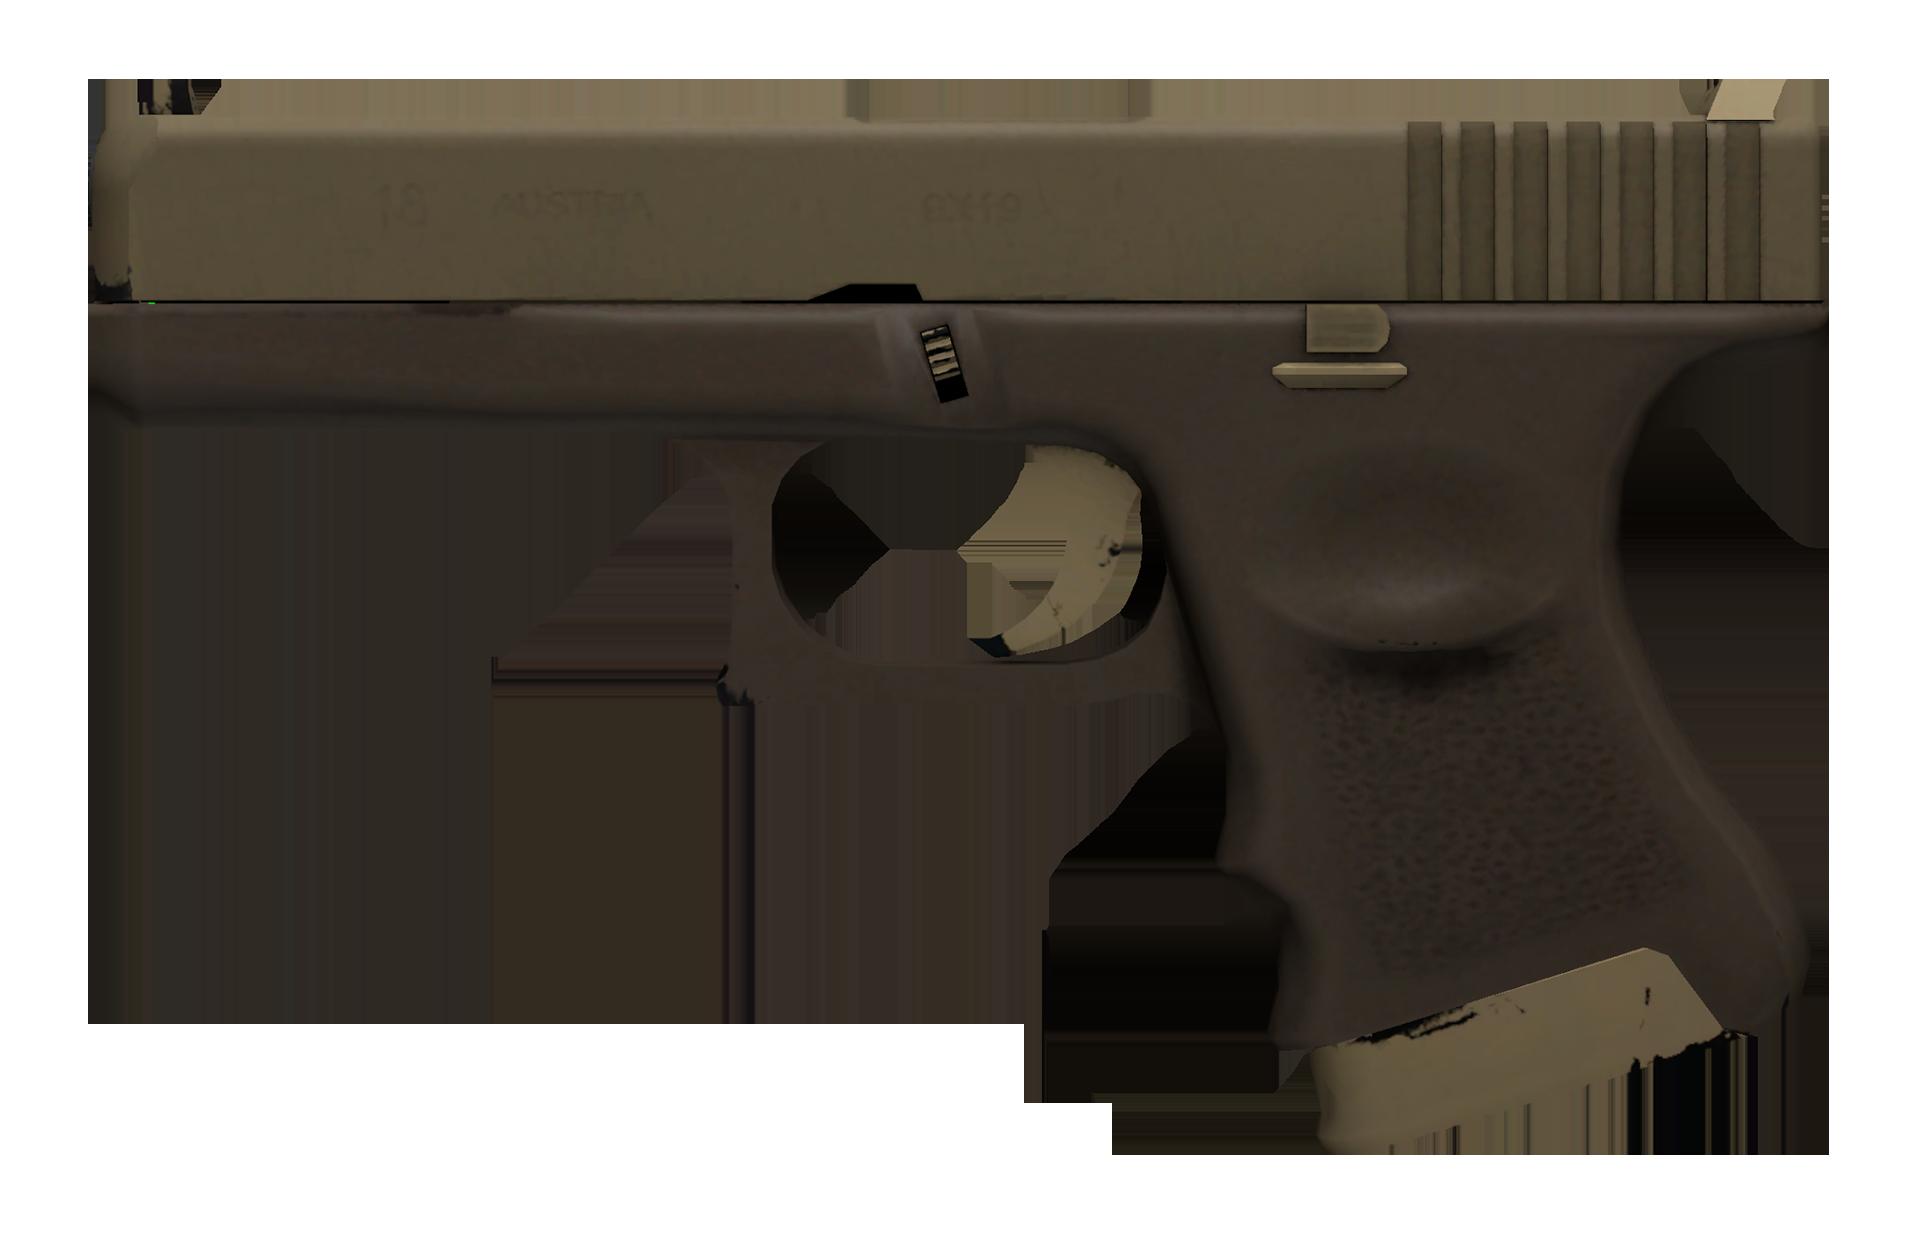 Glock-18 Sand Dune Large Rendering